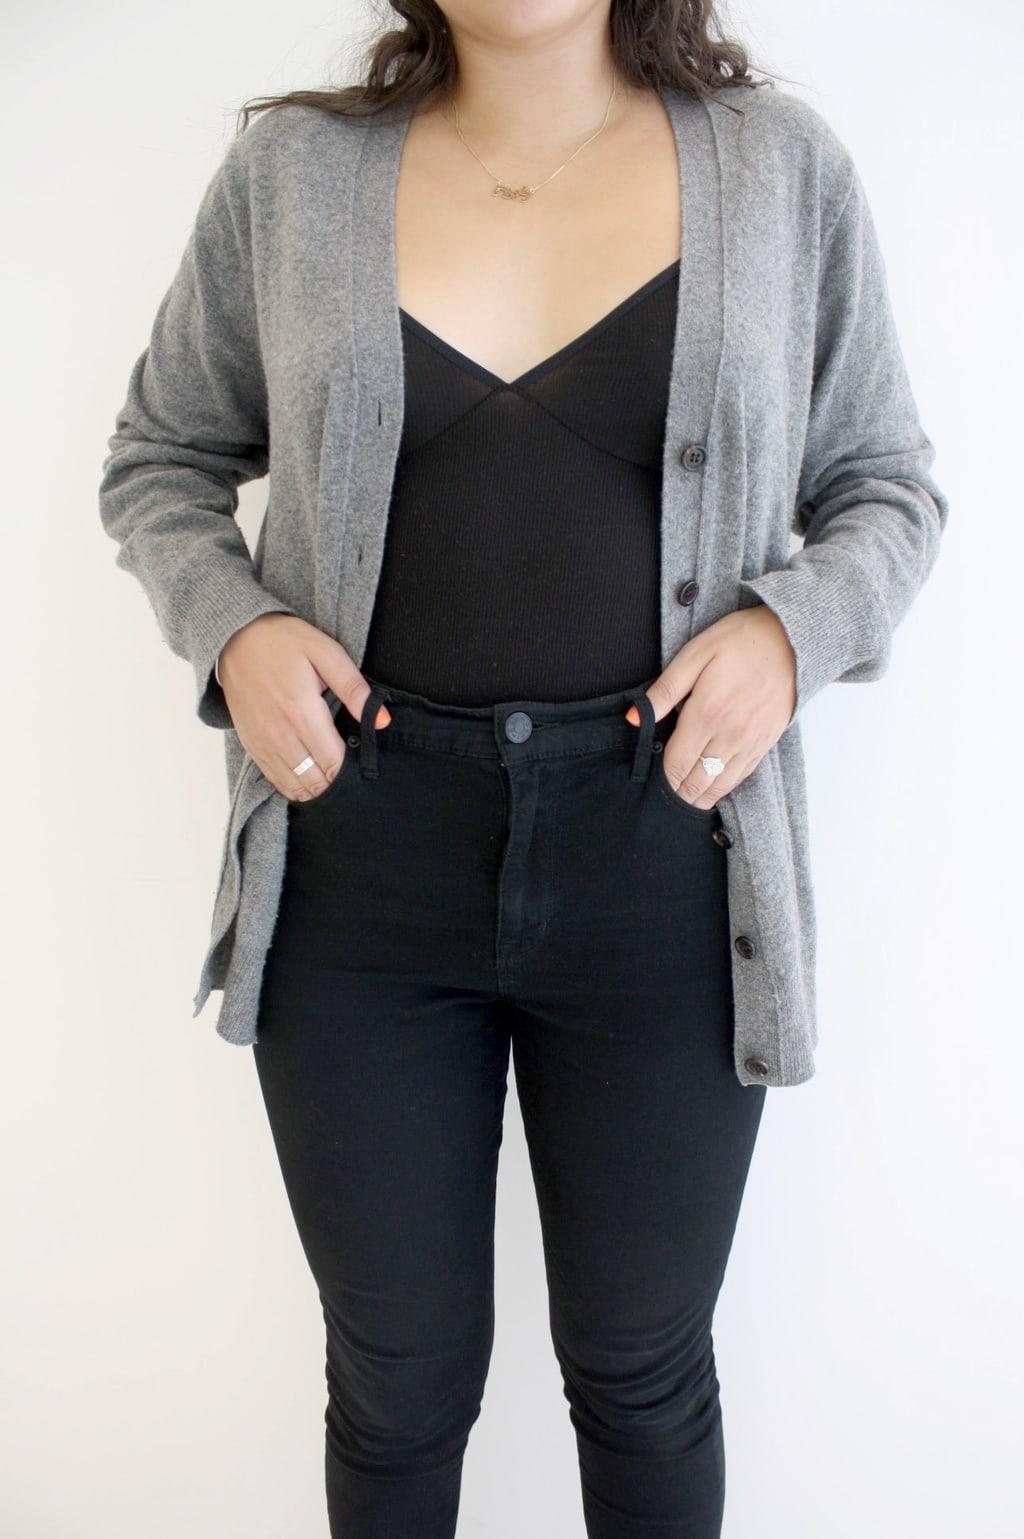 Bodysuit and cardigan - University of Toronto street style